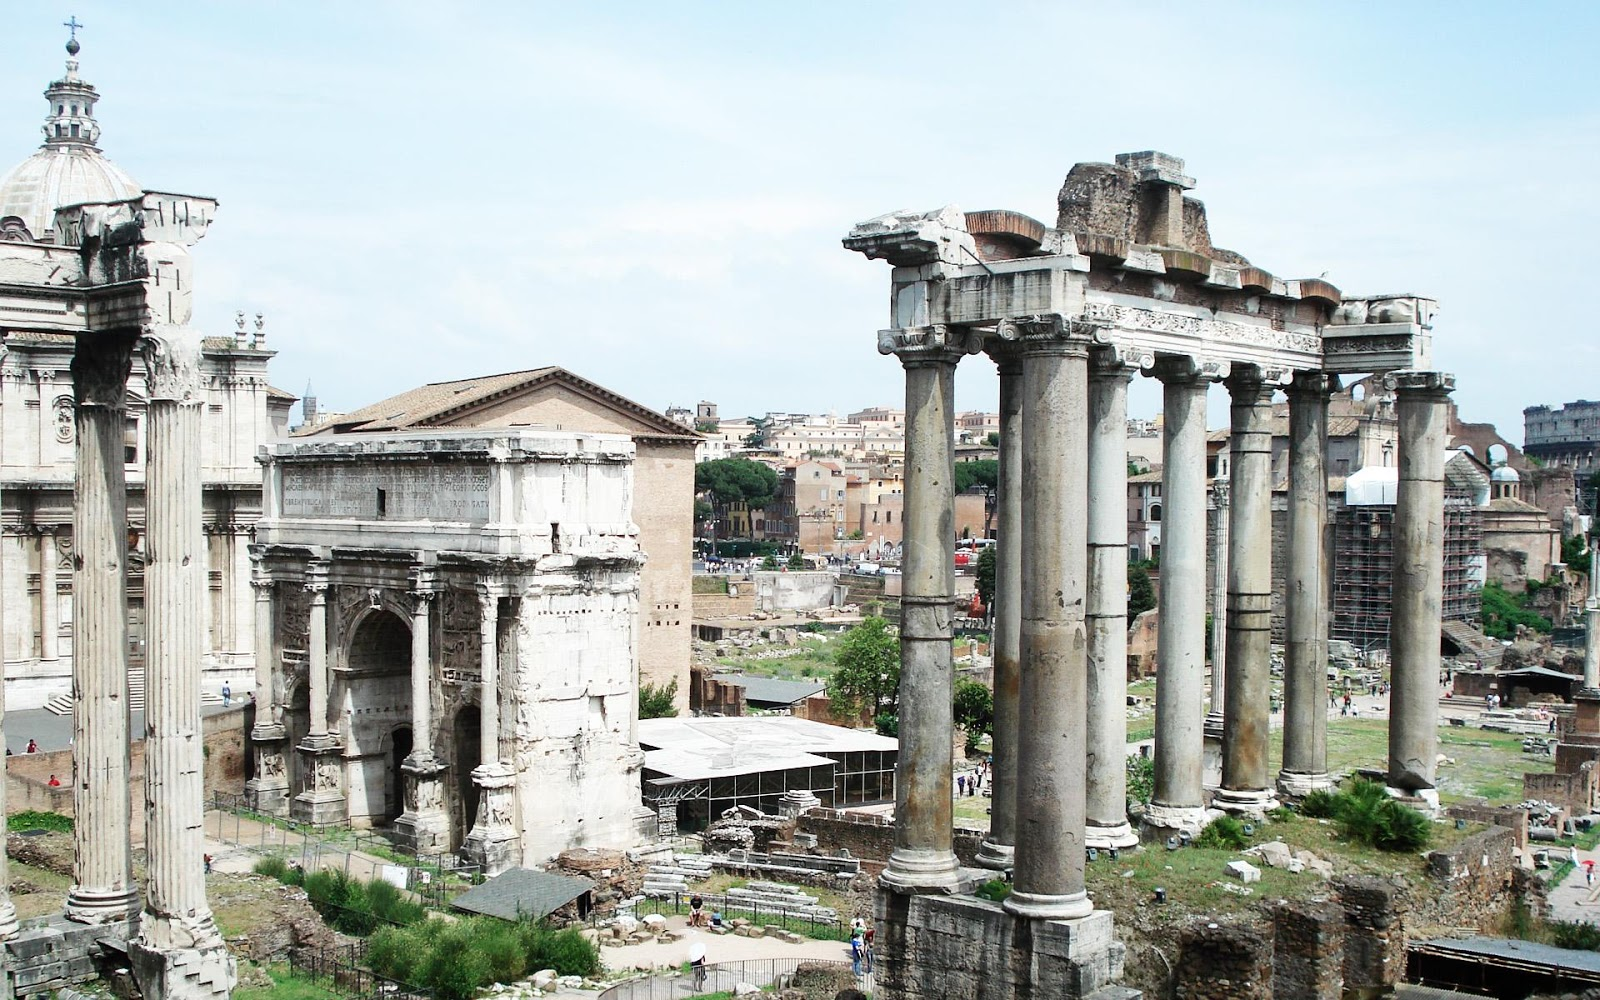 http://1.bp.blogspot.com/-6zj72ocb6ec/UVf9UMzKTjI/AAAAAAAASnI/JwVCcxhVgDw/s1600/Rome-Forum-Romanum-Italy-1200.jpg